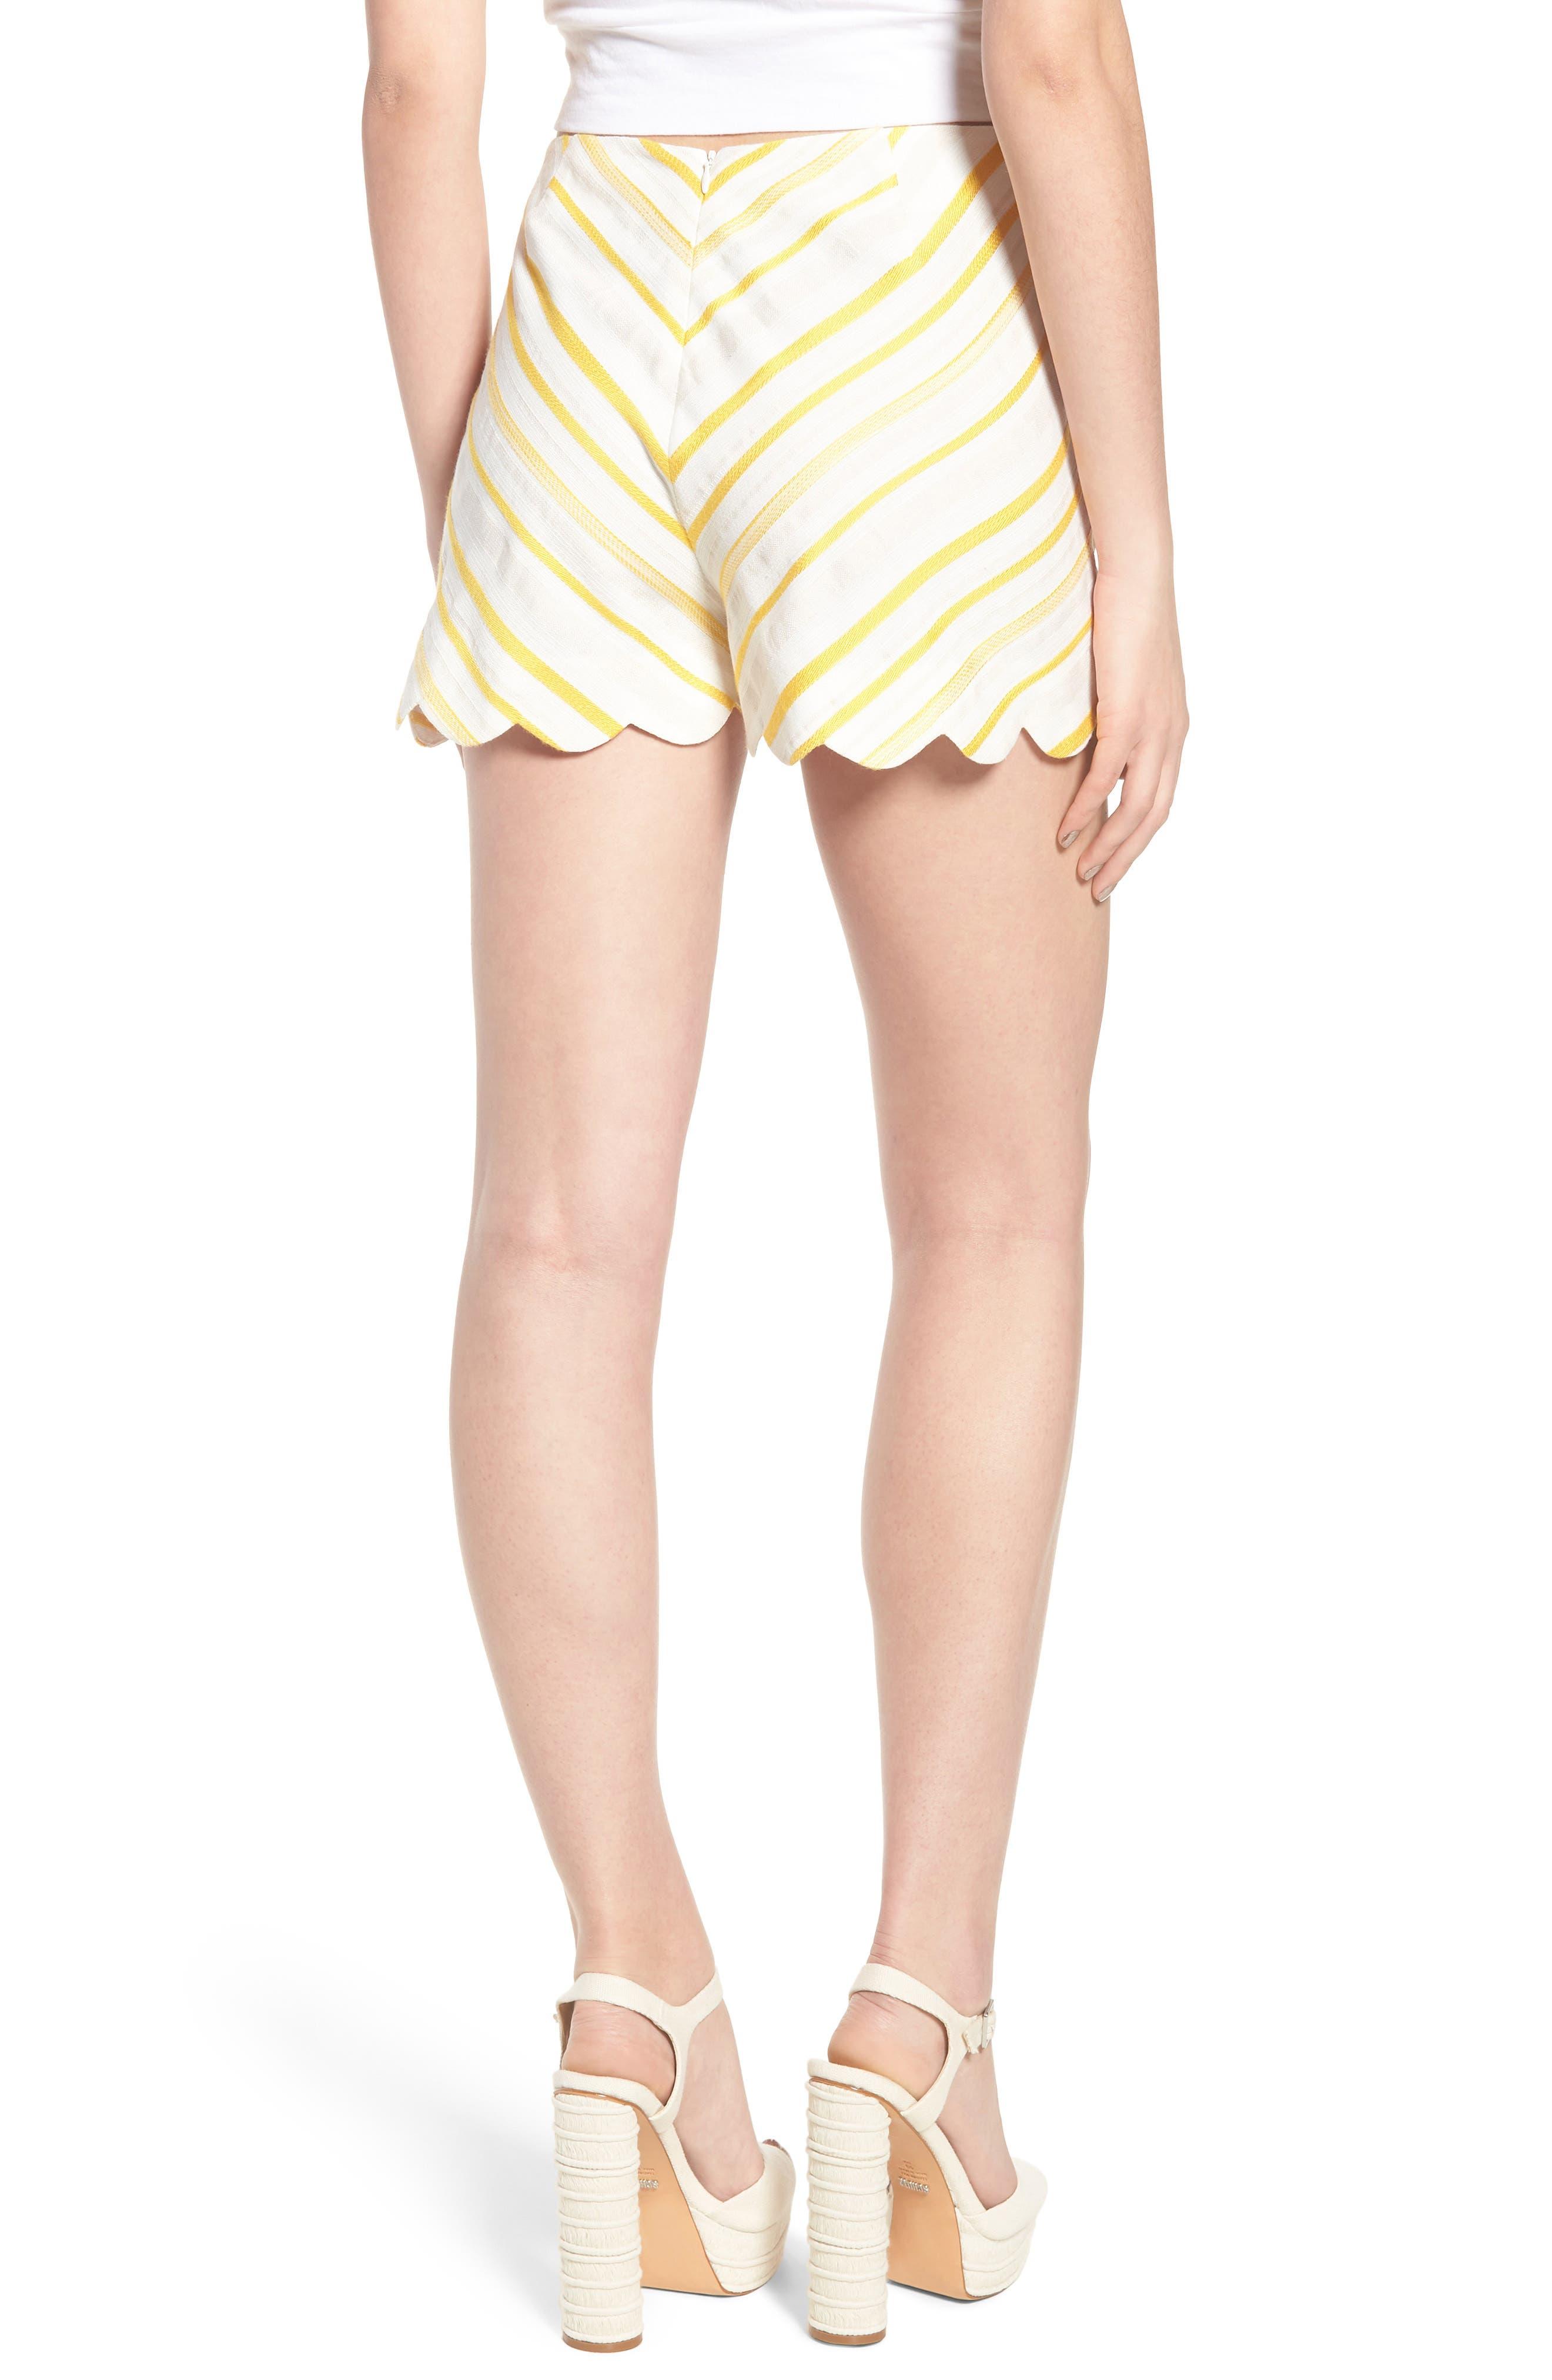 Scallop Shorts,                             Alternate thumbnail 2, color,                             Cream Yellow